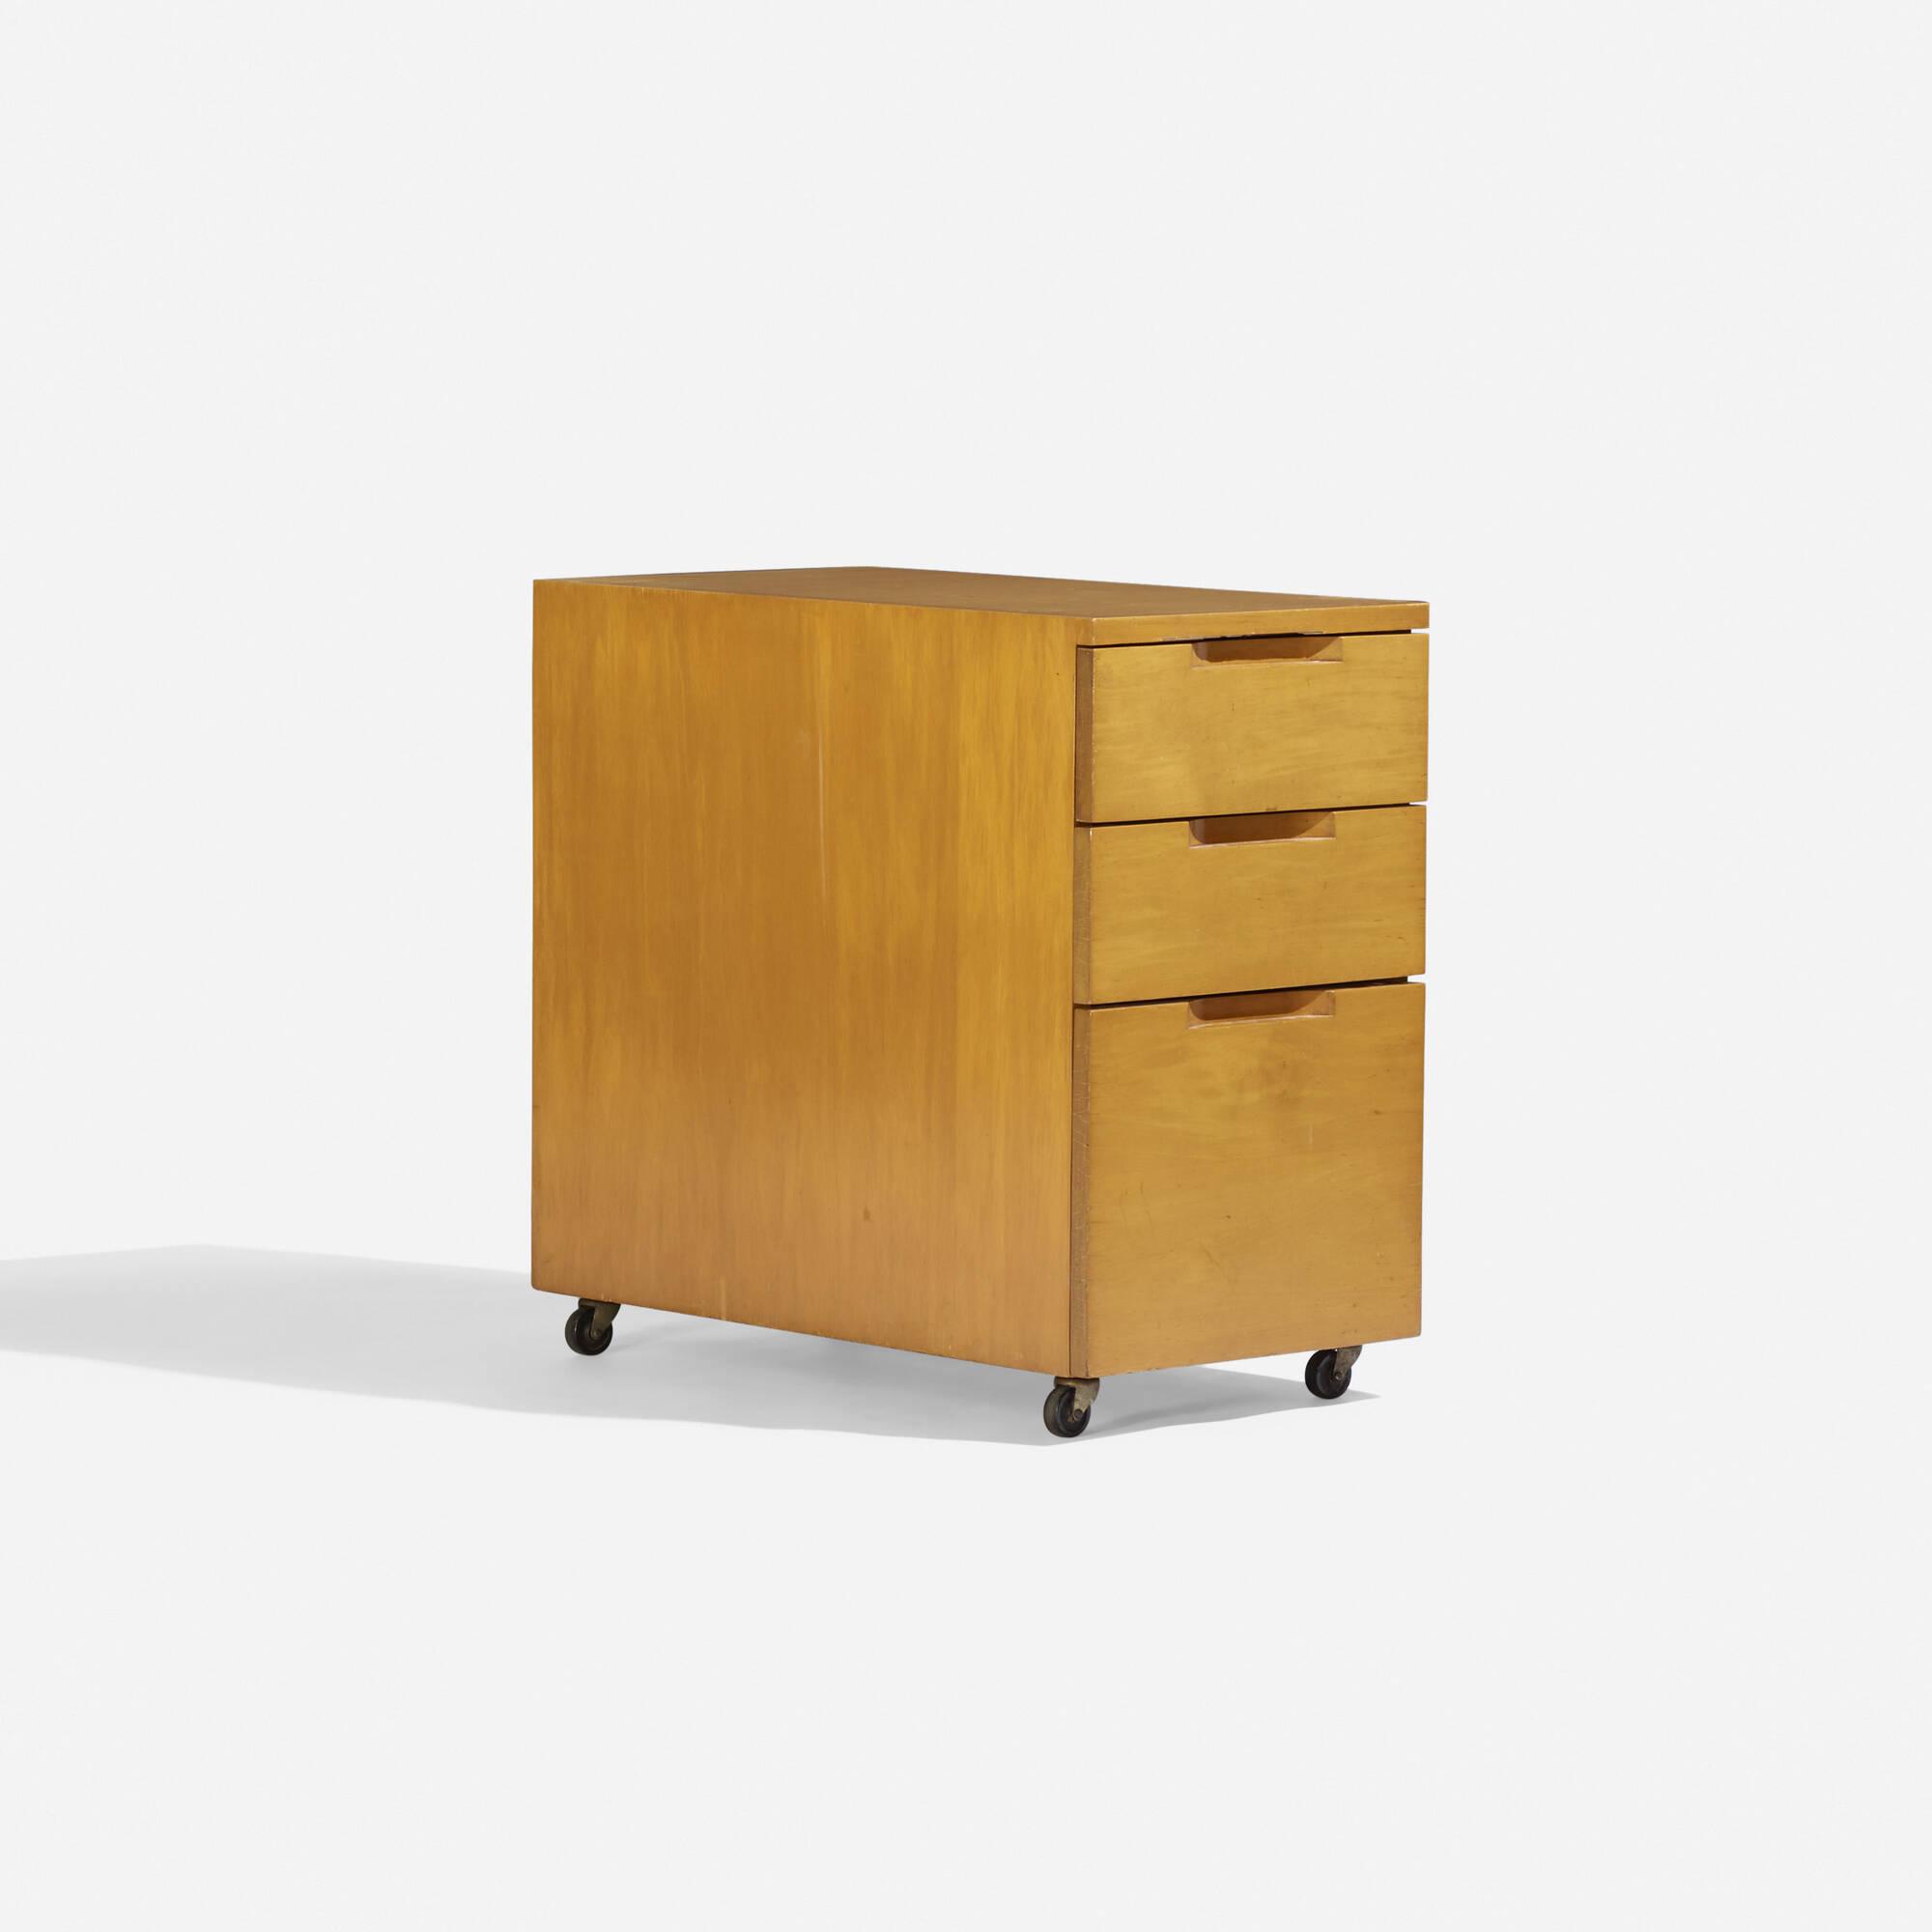 329: Alvar Aalto / cabinet (1 of 1)